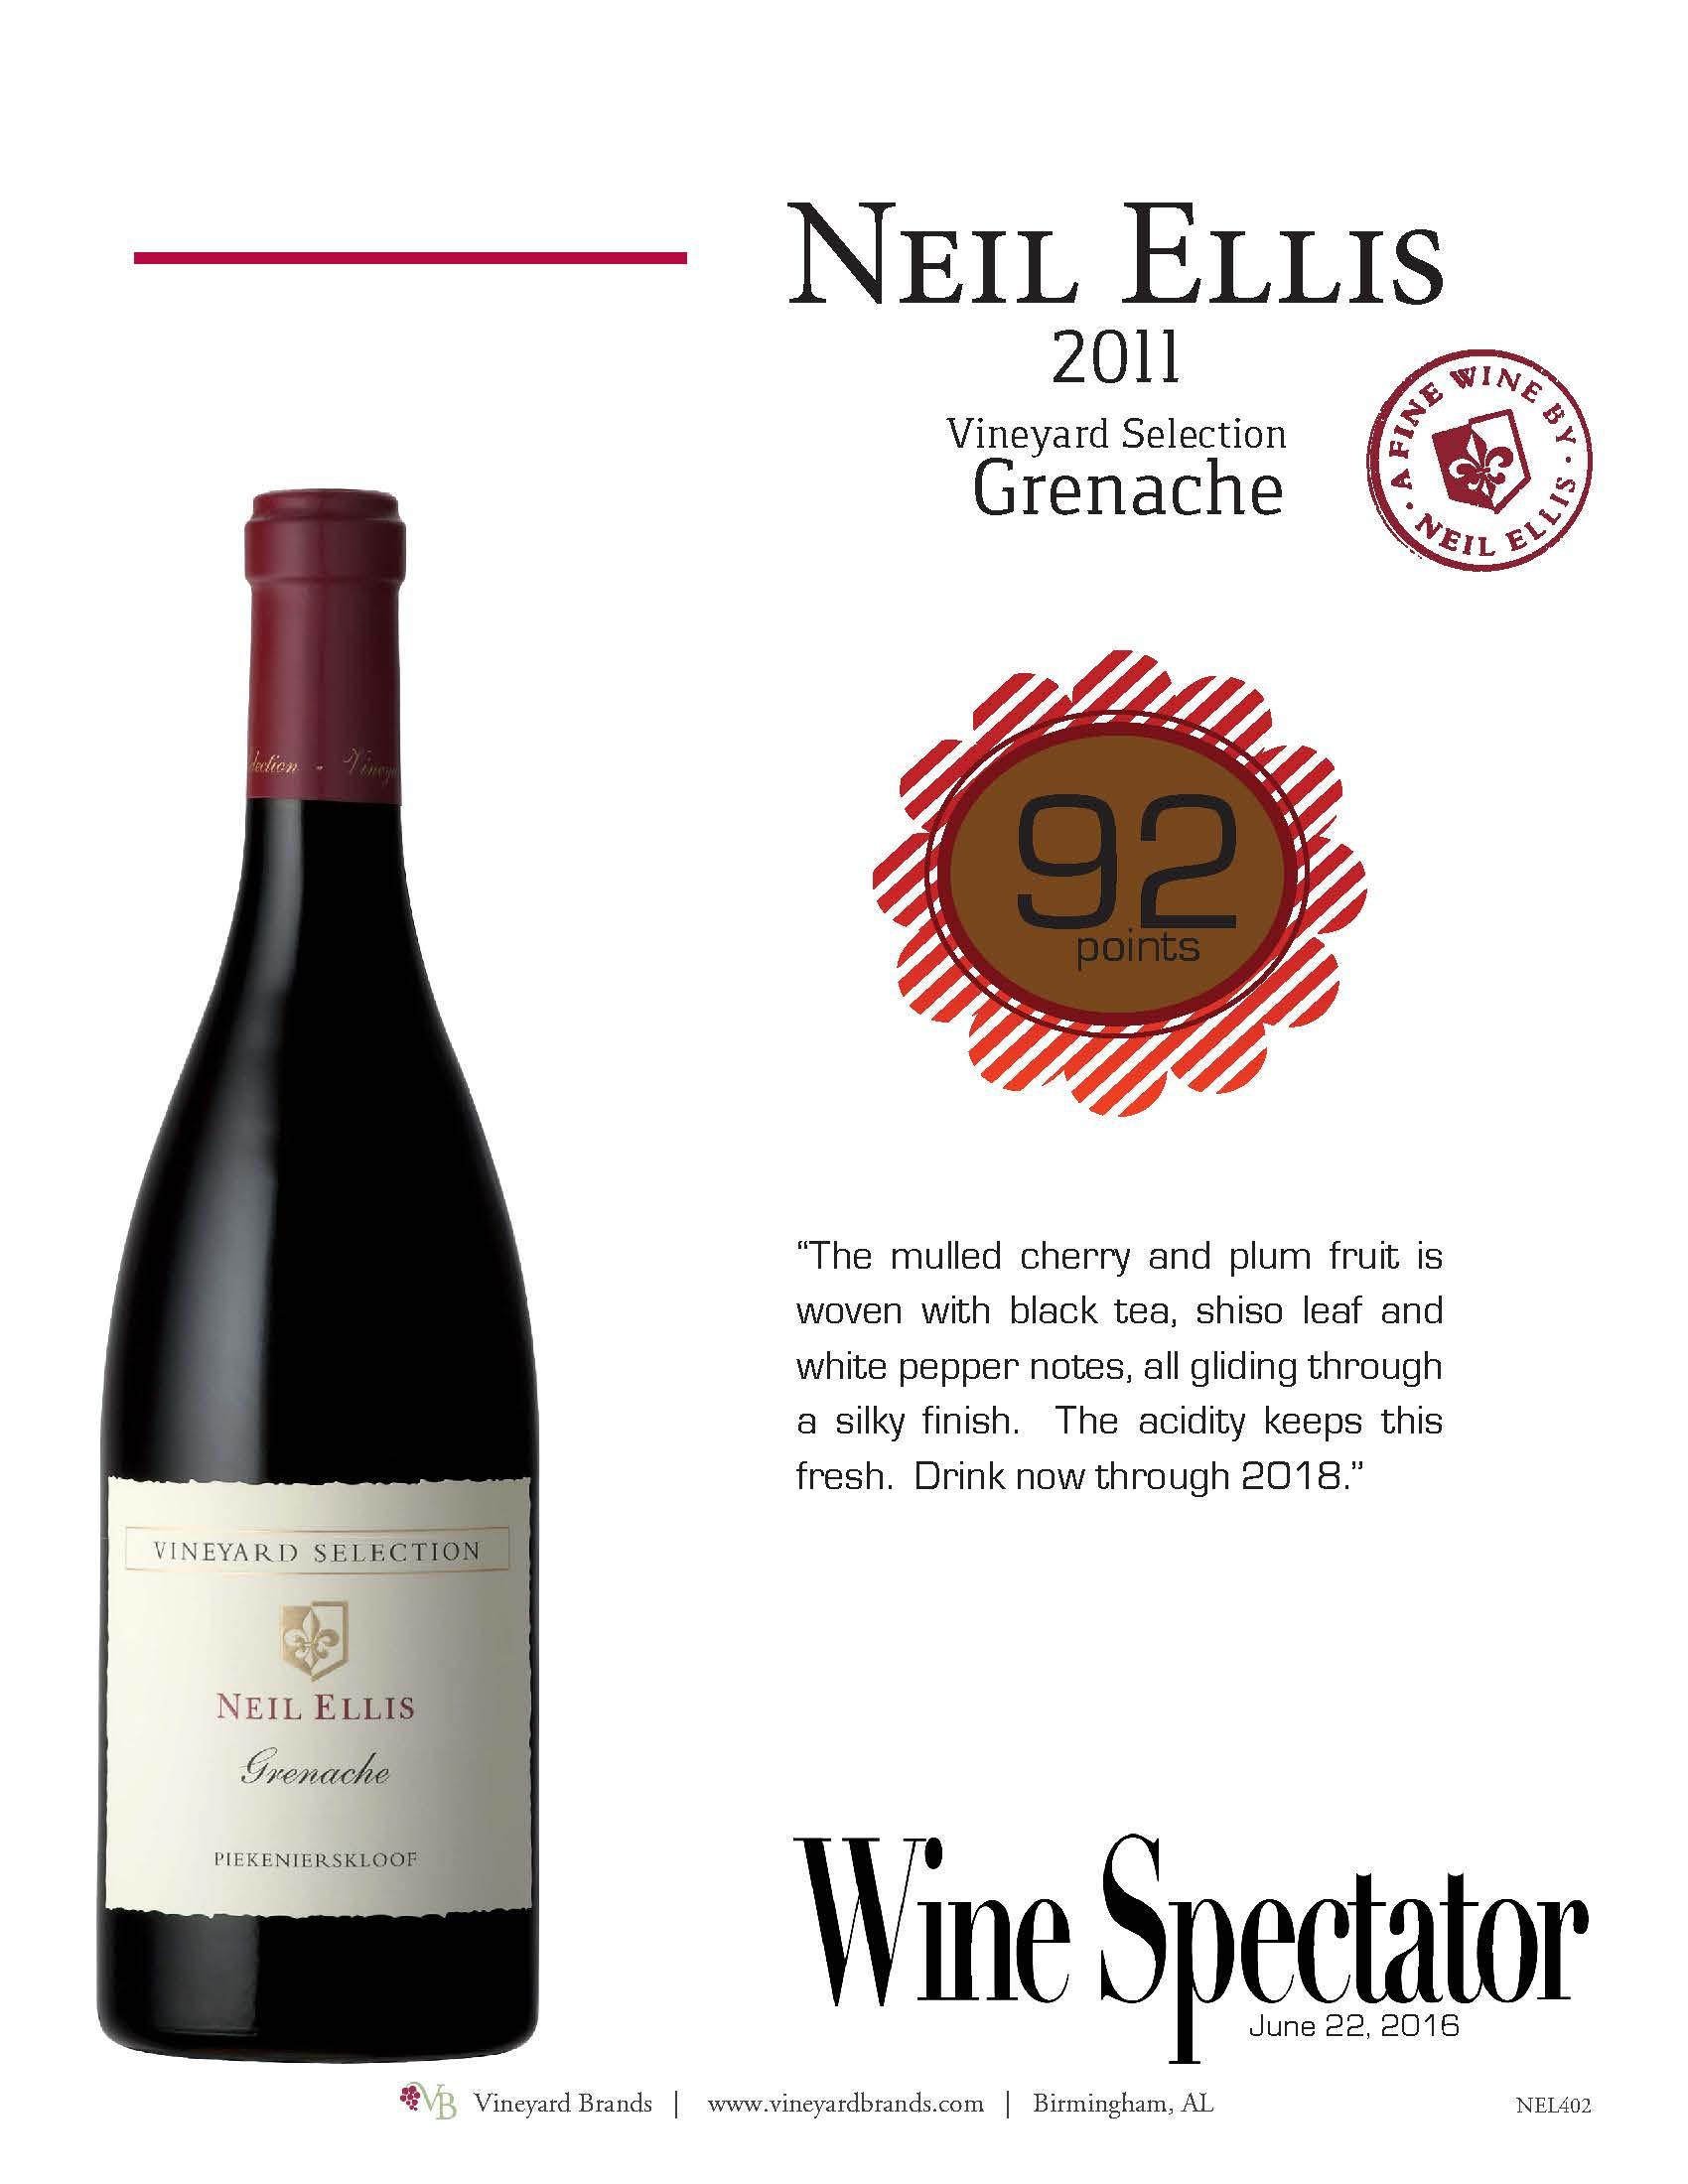 Neil Ellis Grenache 2011 Wine Spectator